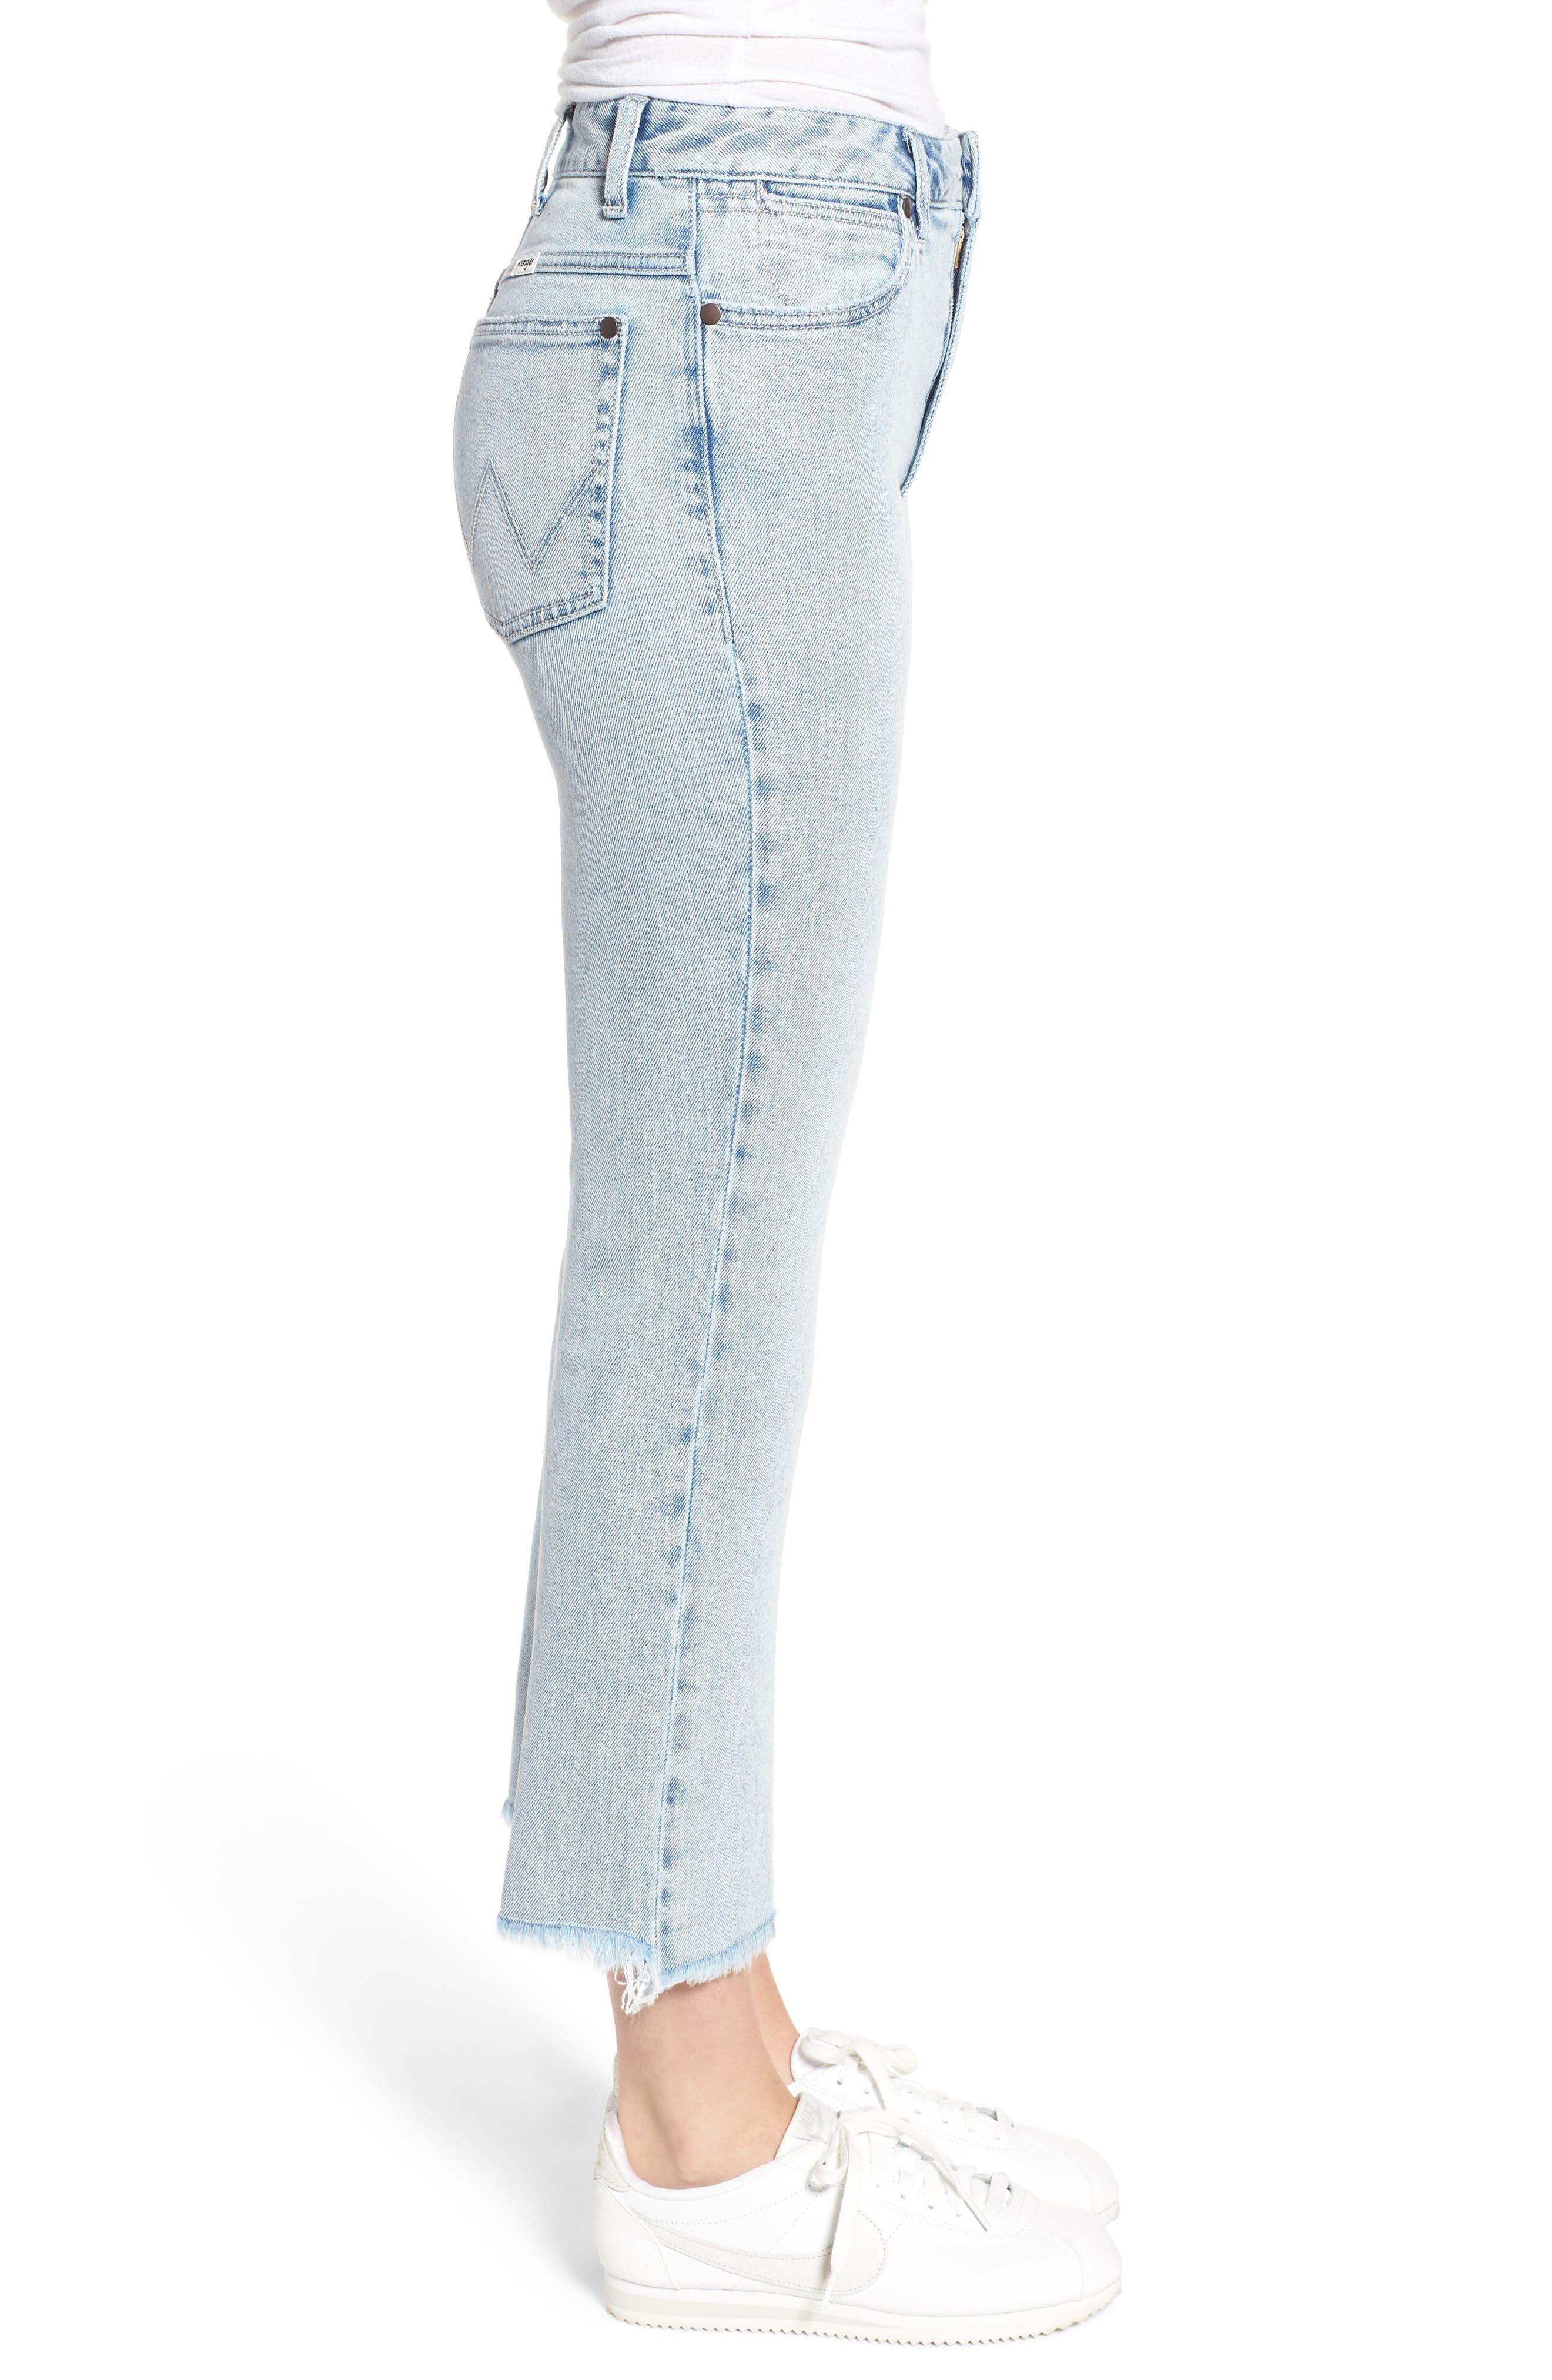 Acid Wash High Waist Crop Jeans,                             Alternate thumbnail 5, color,                             Light Acid